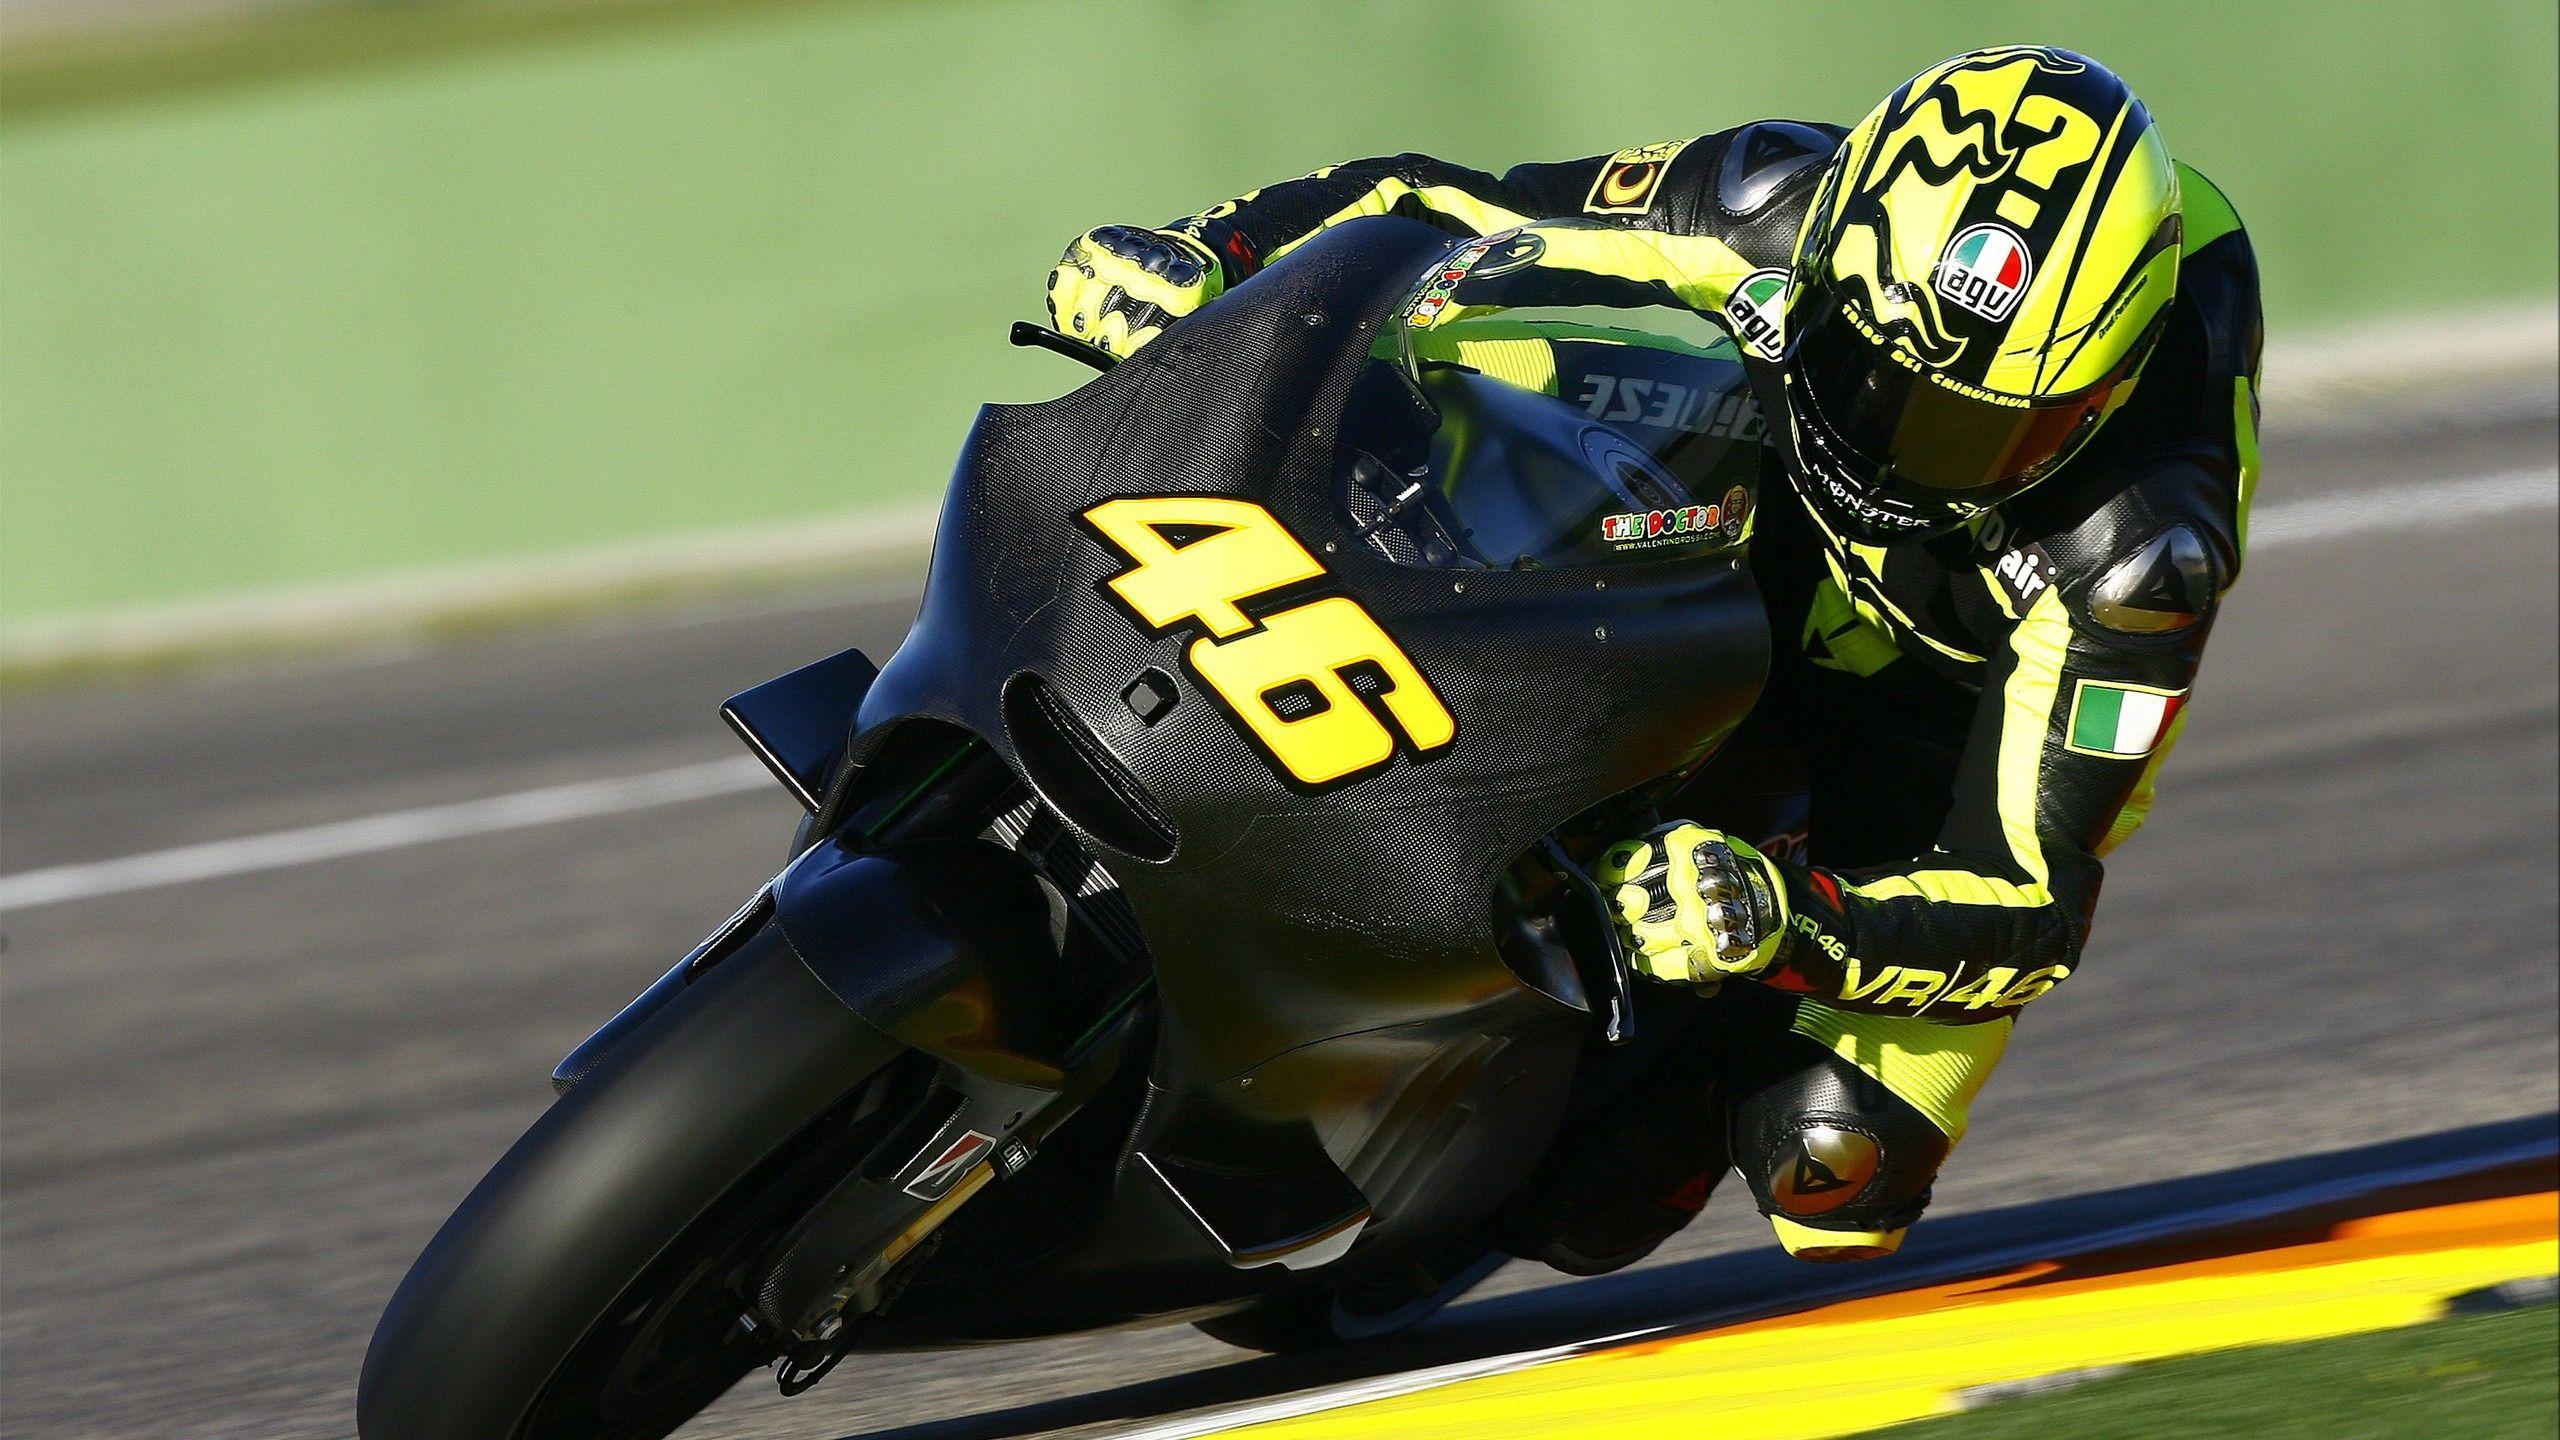 Wallpaper rider motorcycle motogp valentino rossi hd jahir wallpaper rider motorcycle motogp valentino rossi hd voltagebd Gallery